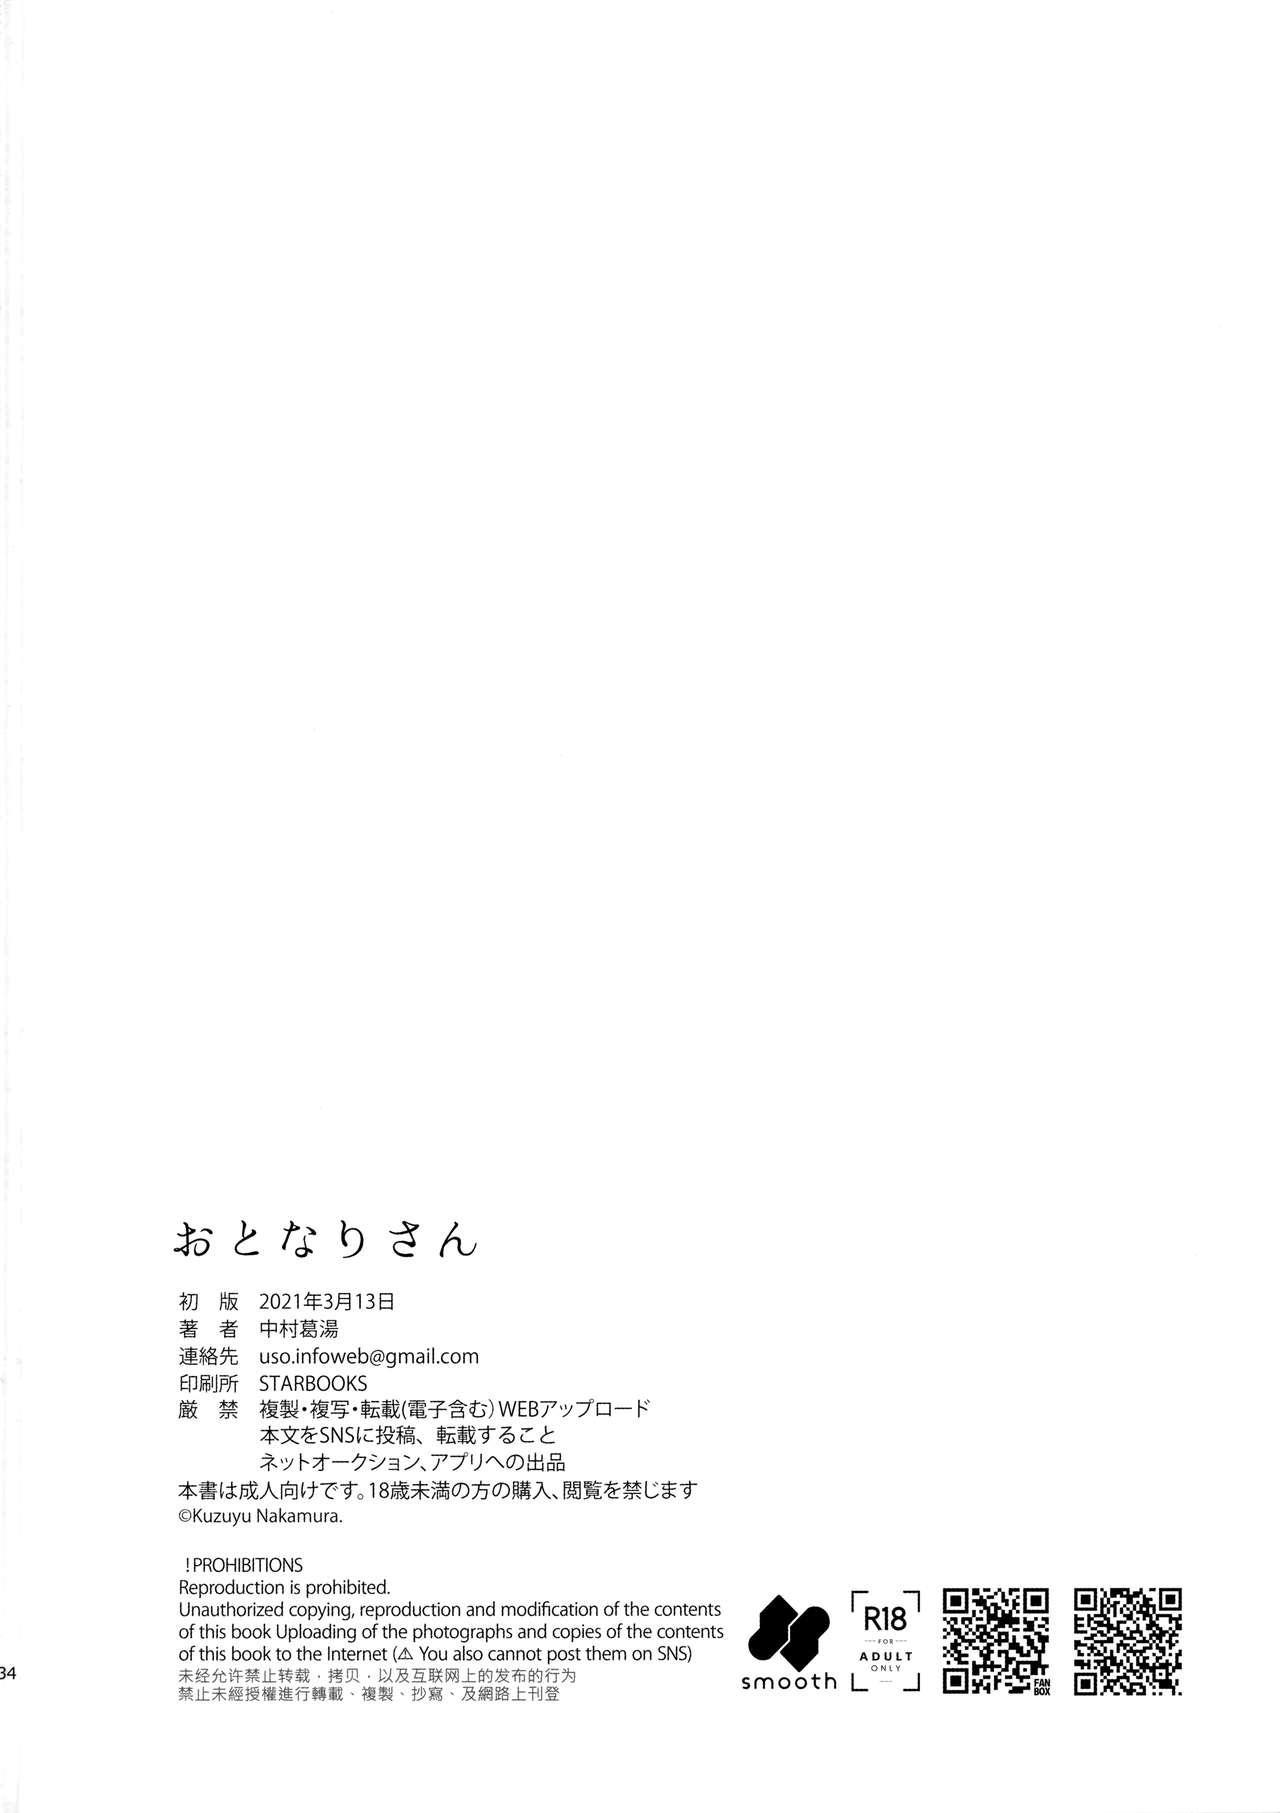 Otonari-san 33